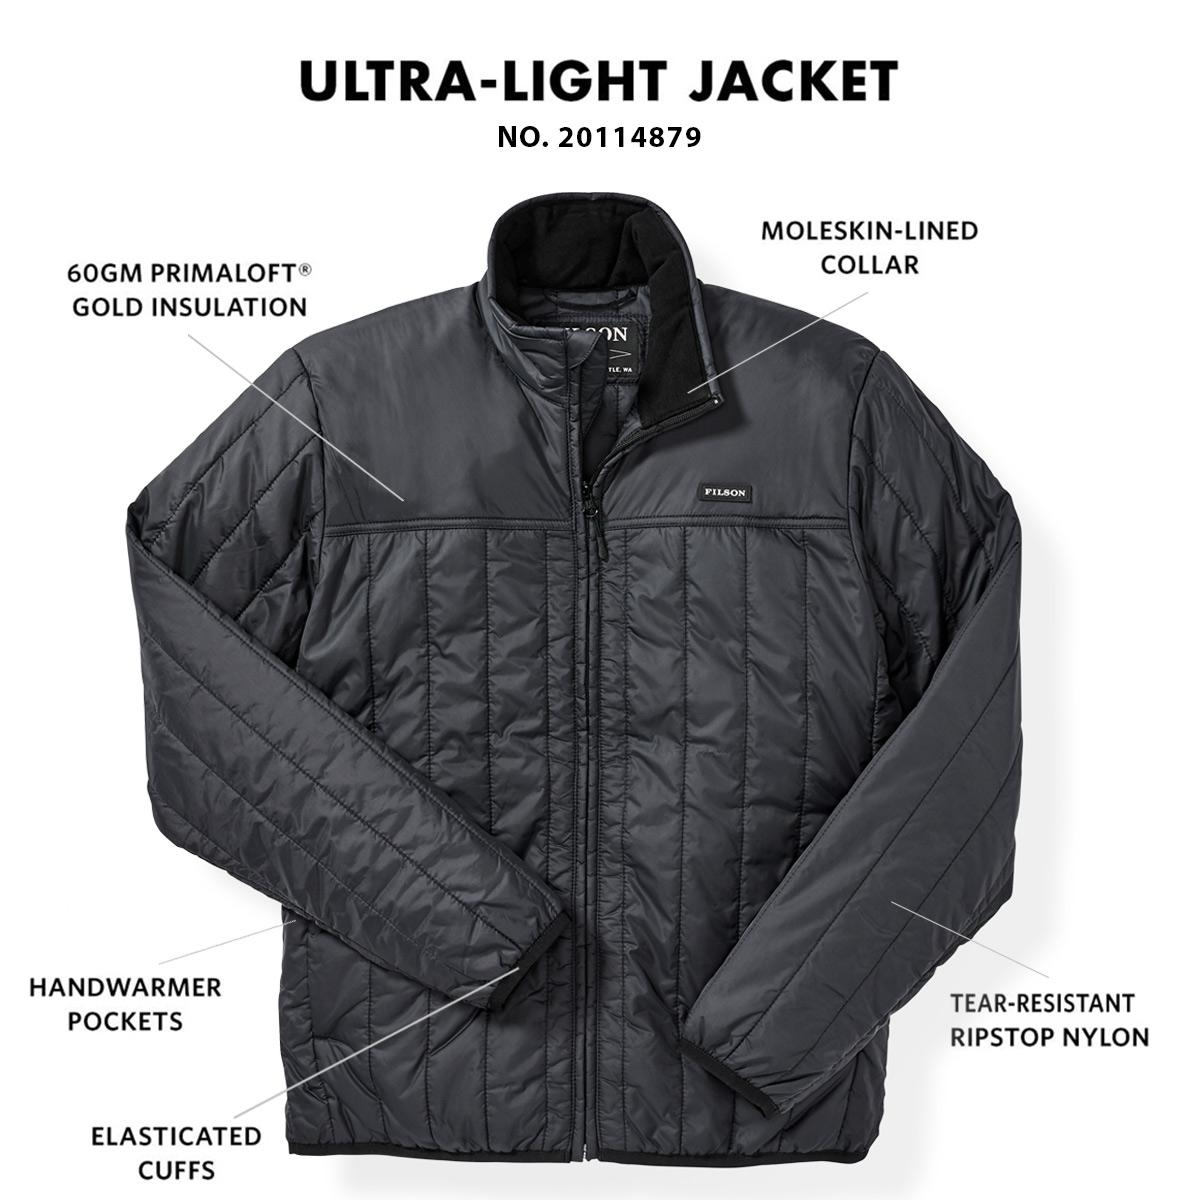 Filson Ultra Light Jacket Black, met Cordura® Ripstop nylon en 60gm PrimaLoft® Gold isolatie